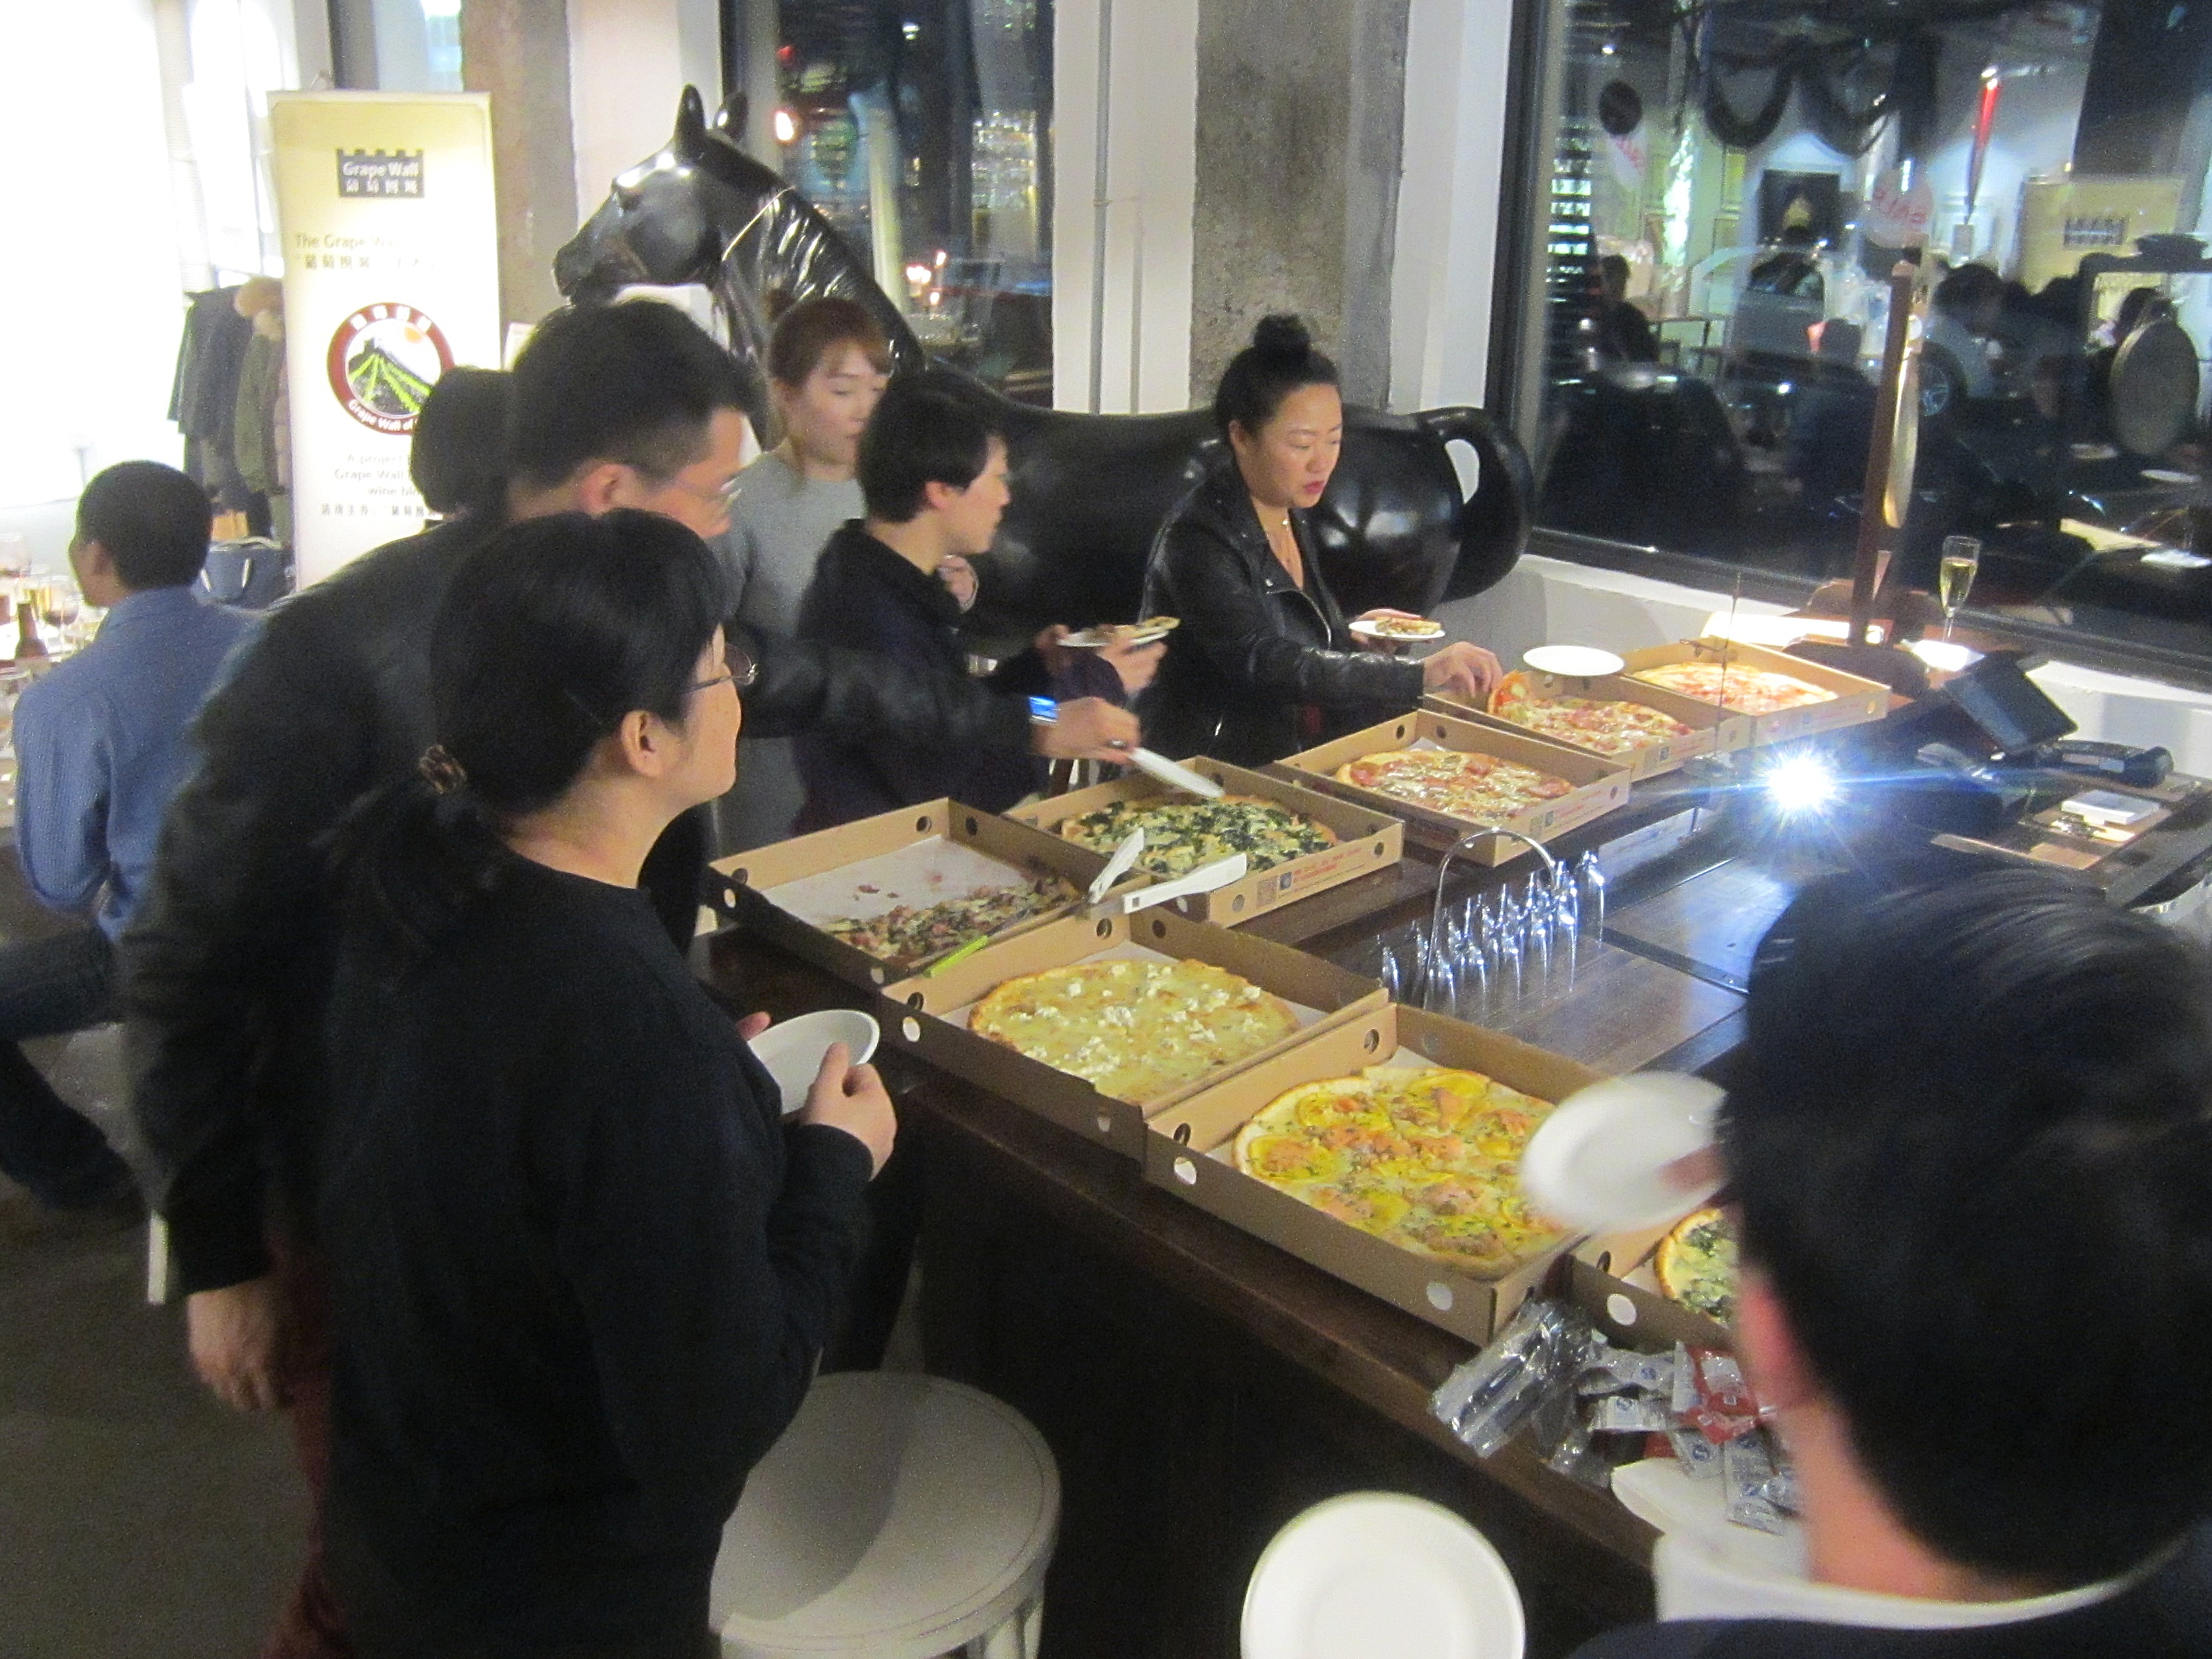 gwc grape wall challenge 8 at pop-up beijing (36)